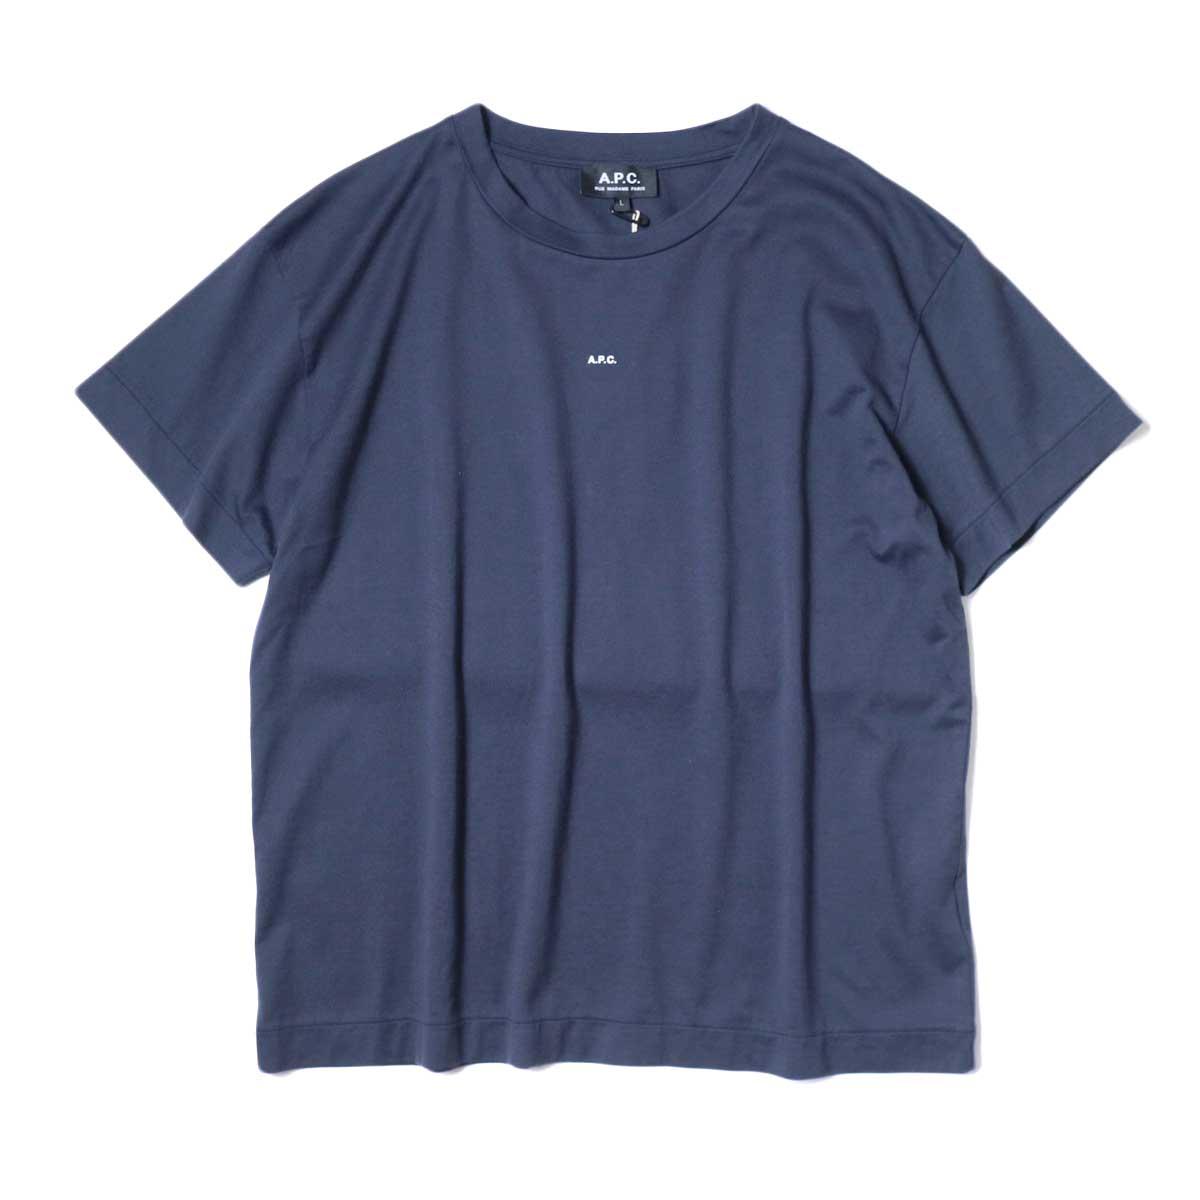 A.P.C. / Jade Tシャツ (Navy)